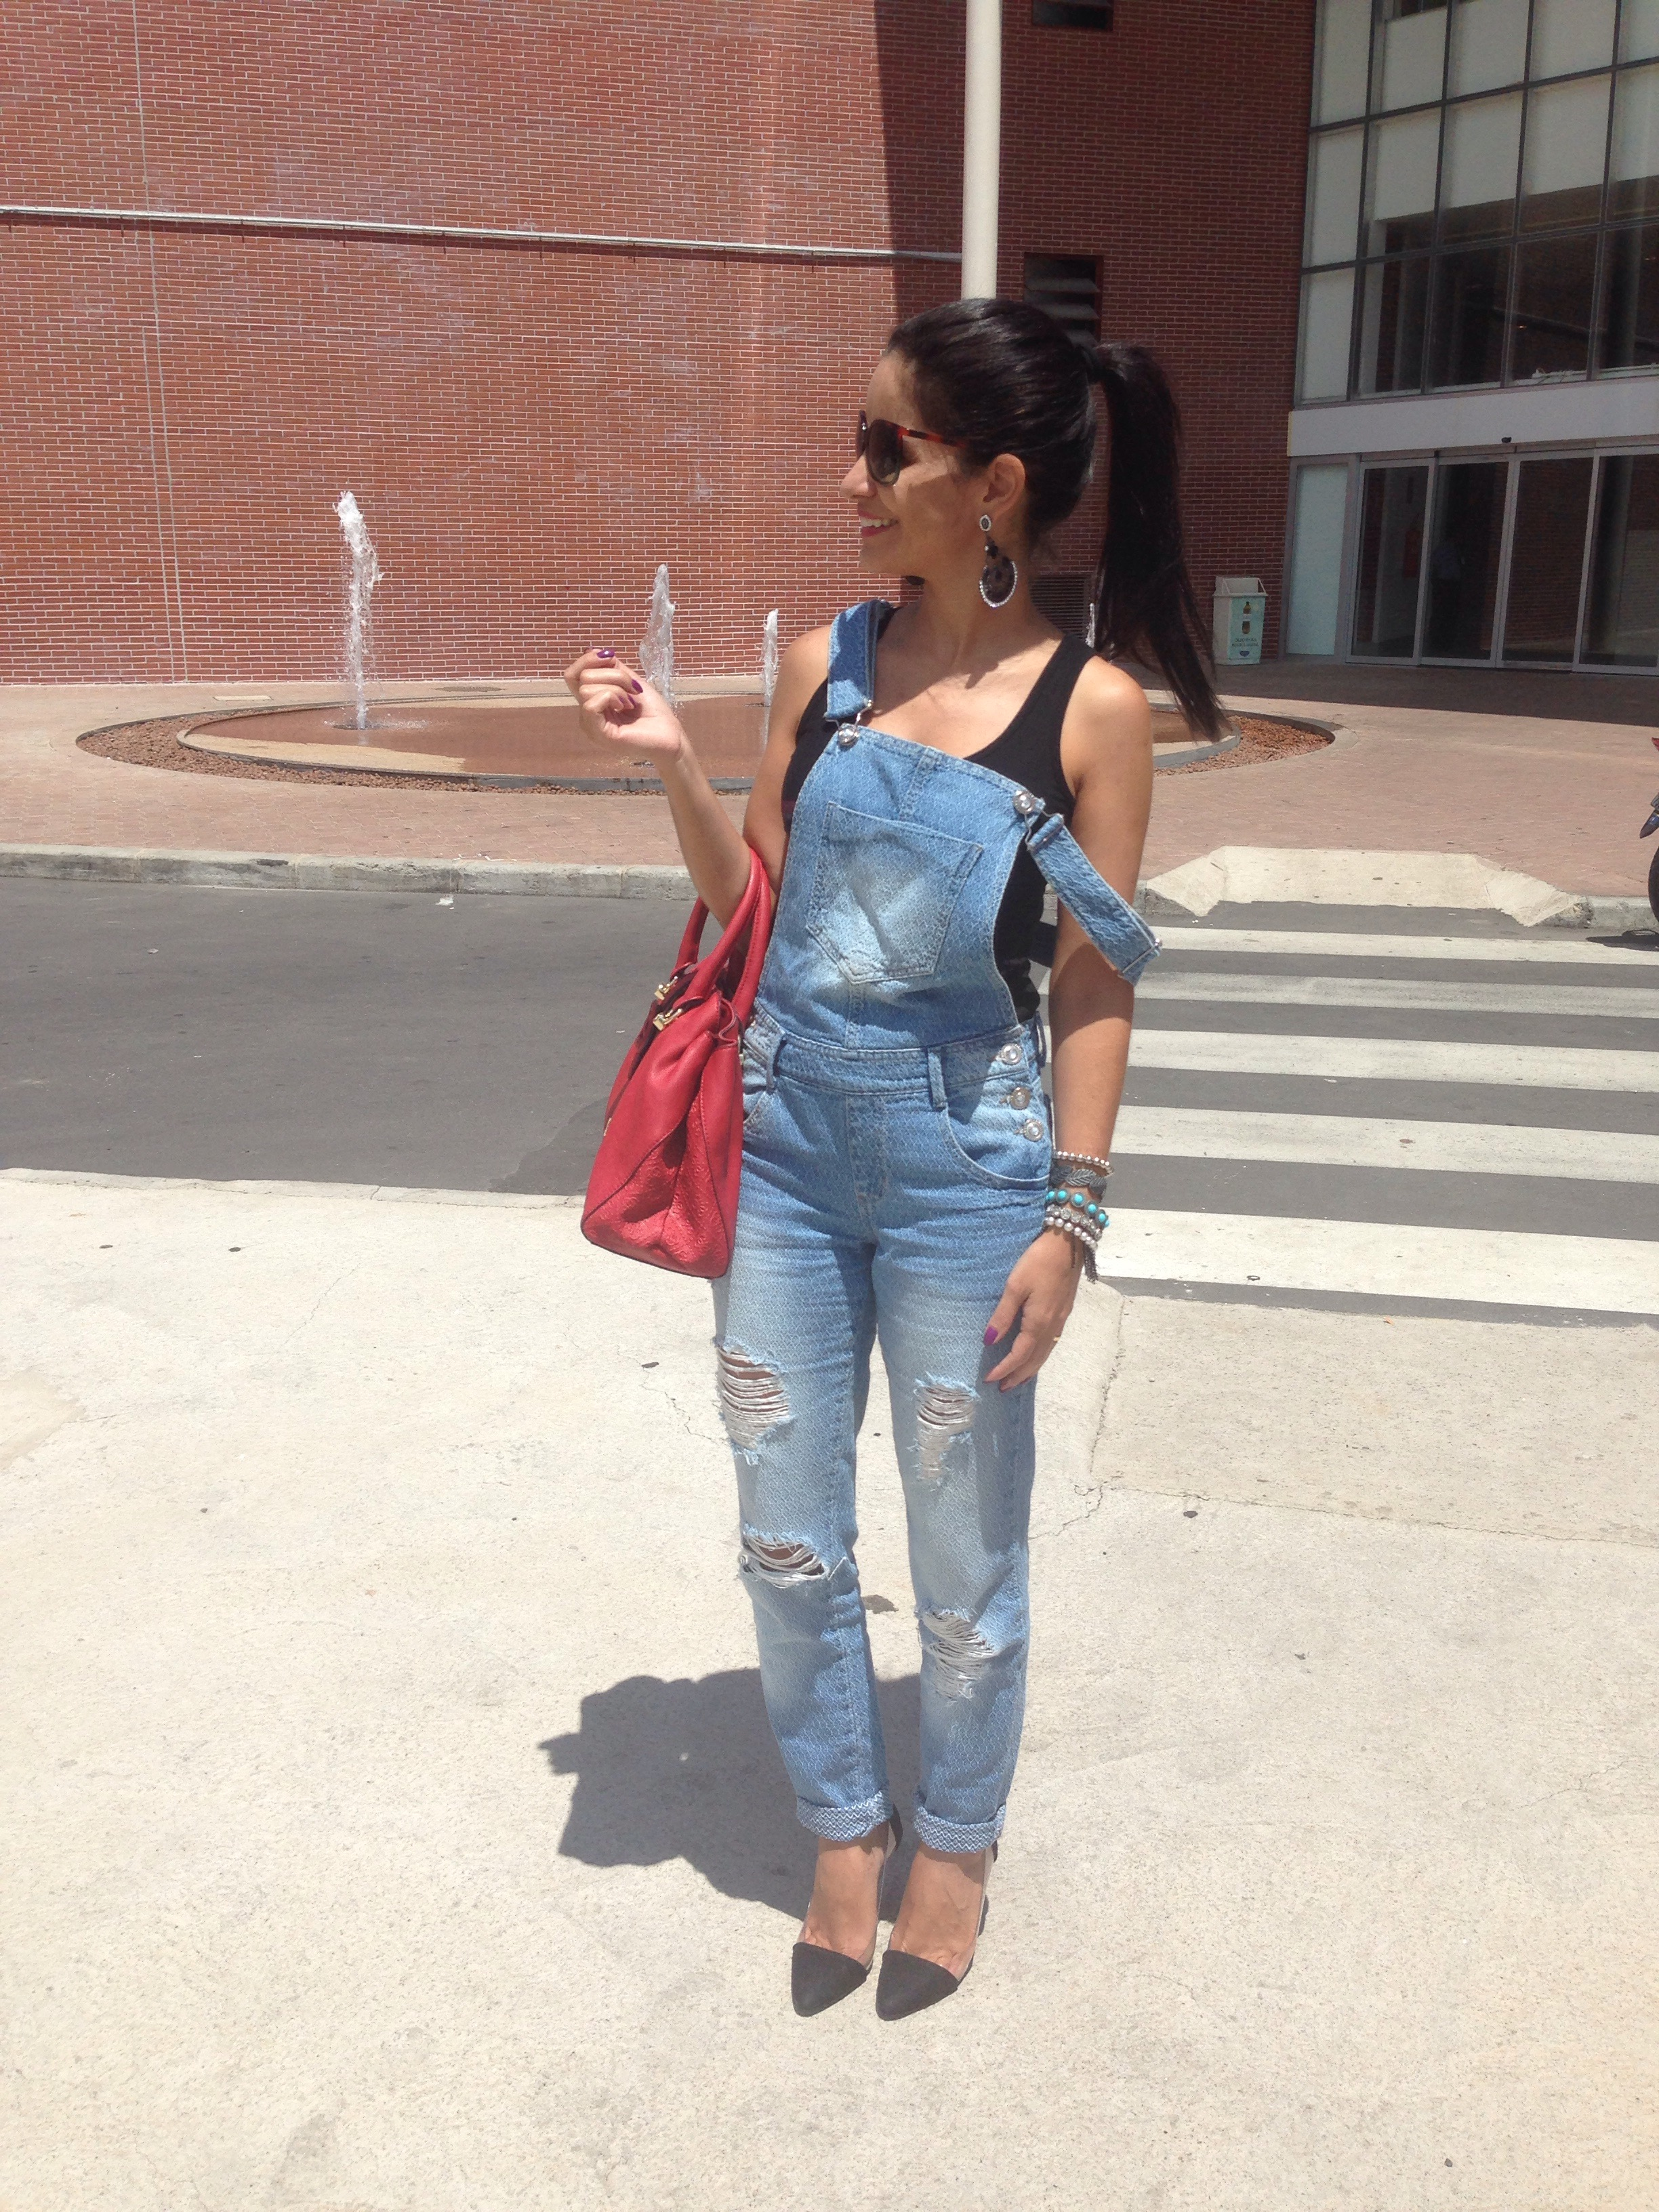 ca3d6c55f Jardineira: Marisa   Camiseta: Guess  Bolsa: Guess   Sapato: Sonho dos pés